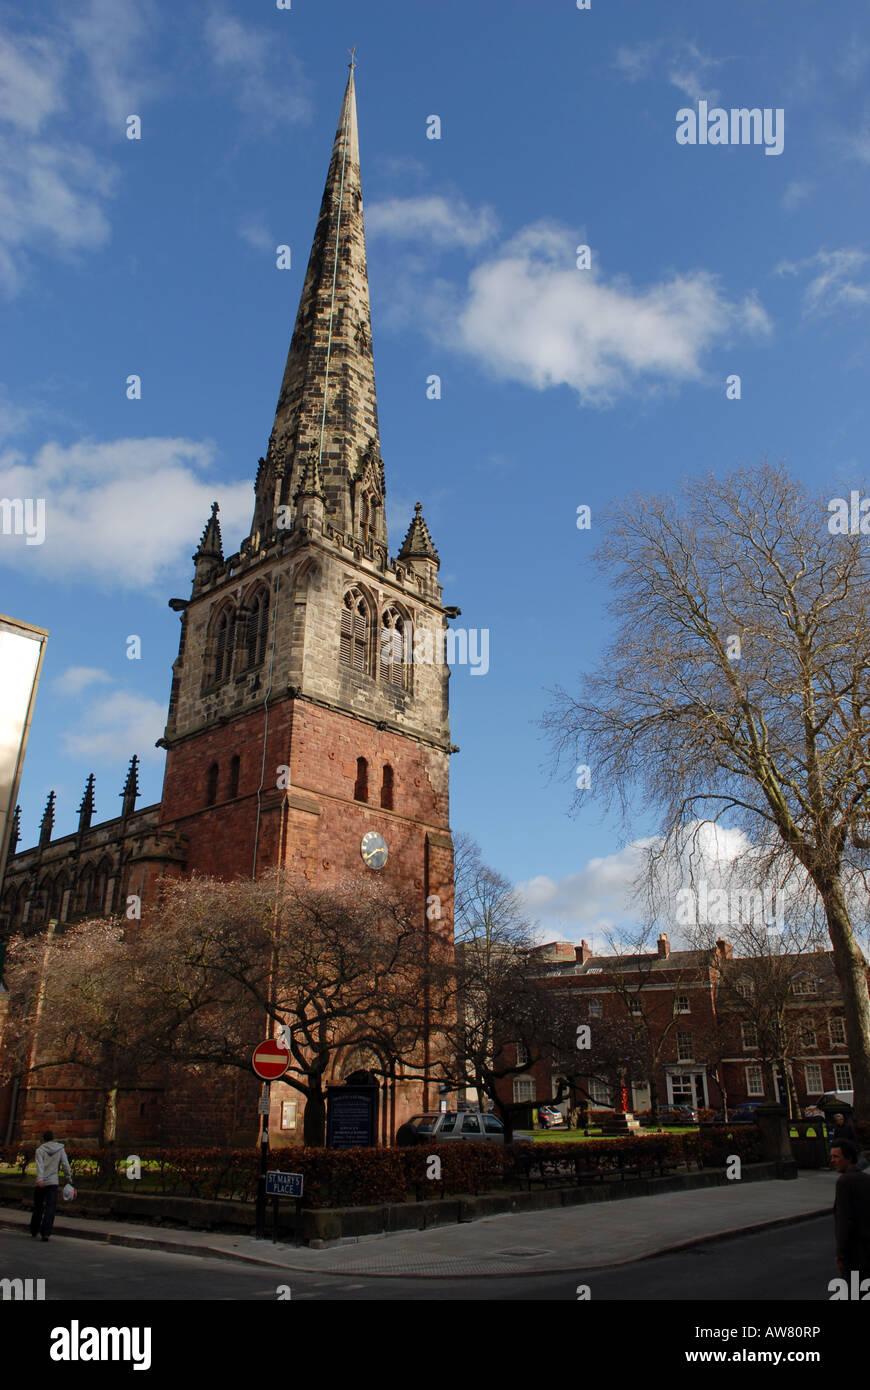 St Mary s church in Shrewsbury Shropshire - Stock Image